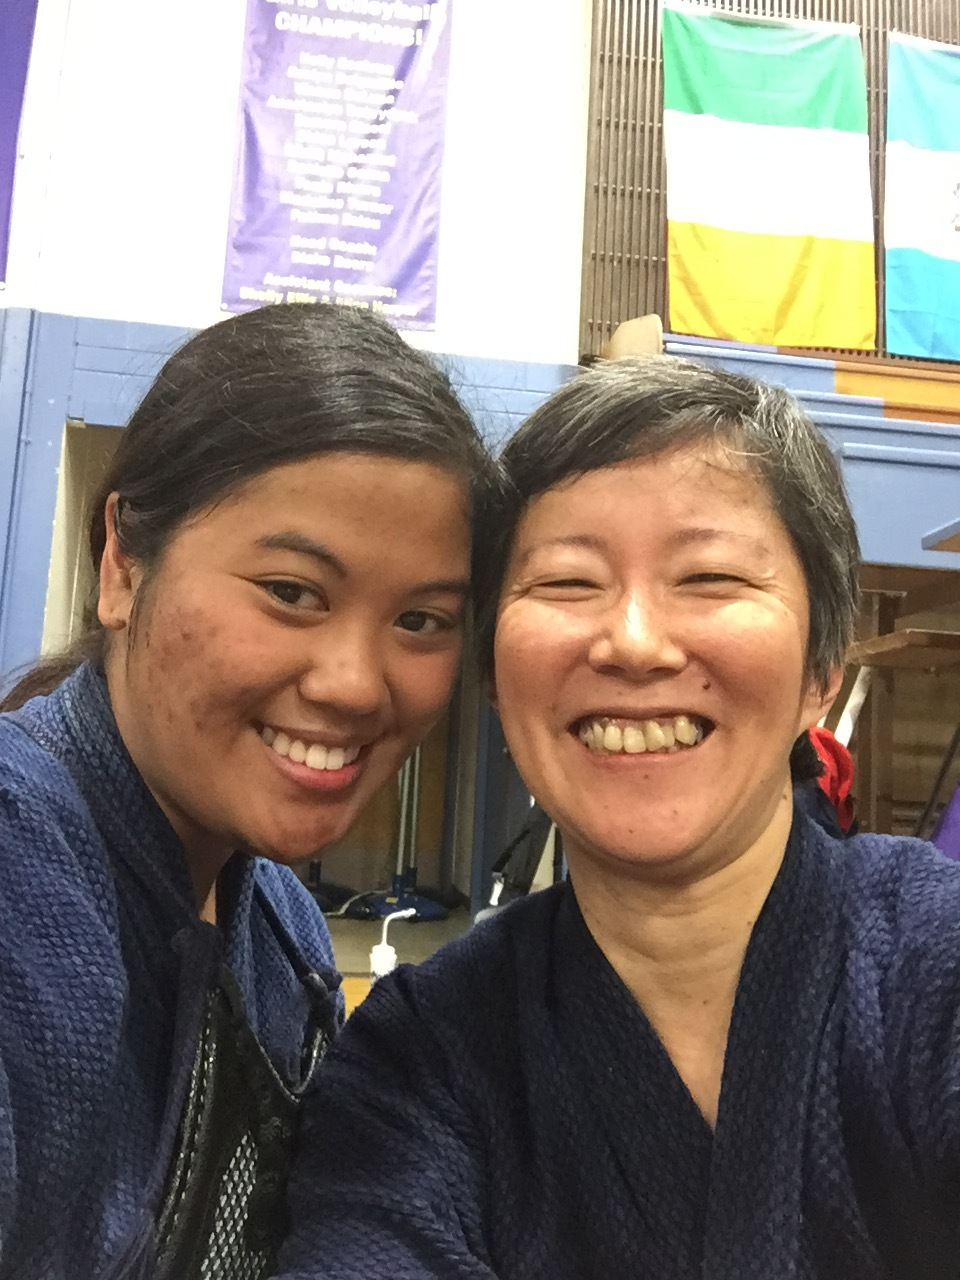 Reiko made some nice frineds - here with Anita Espiritu (Edmonton, Canada).  Photo by Hayashi.